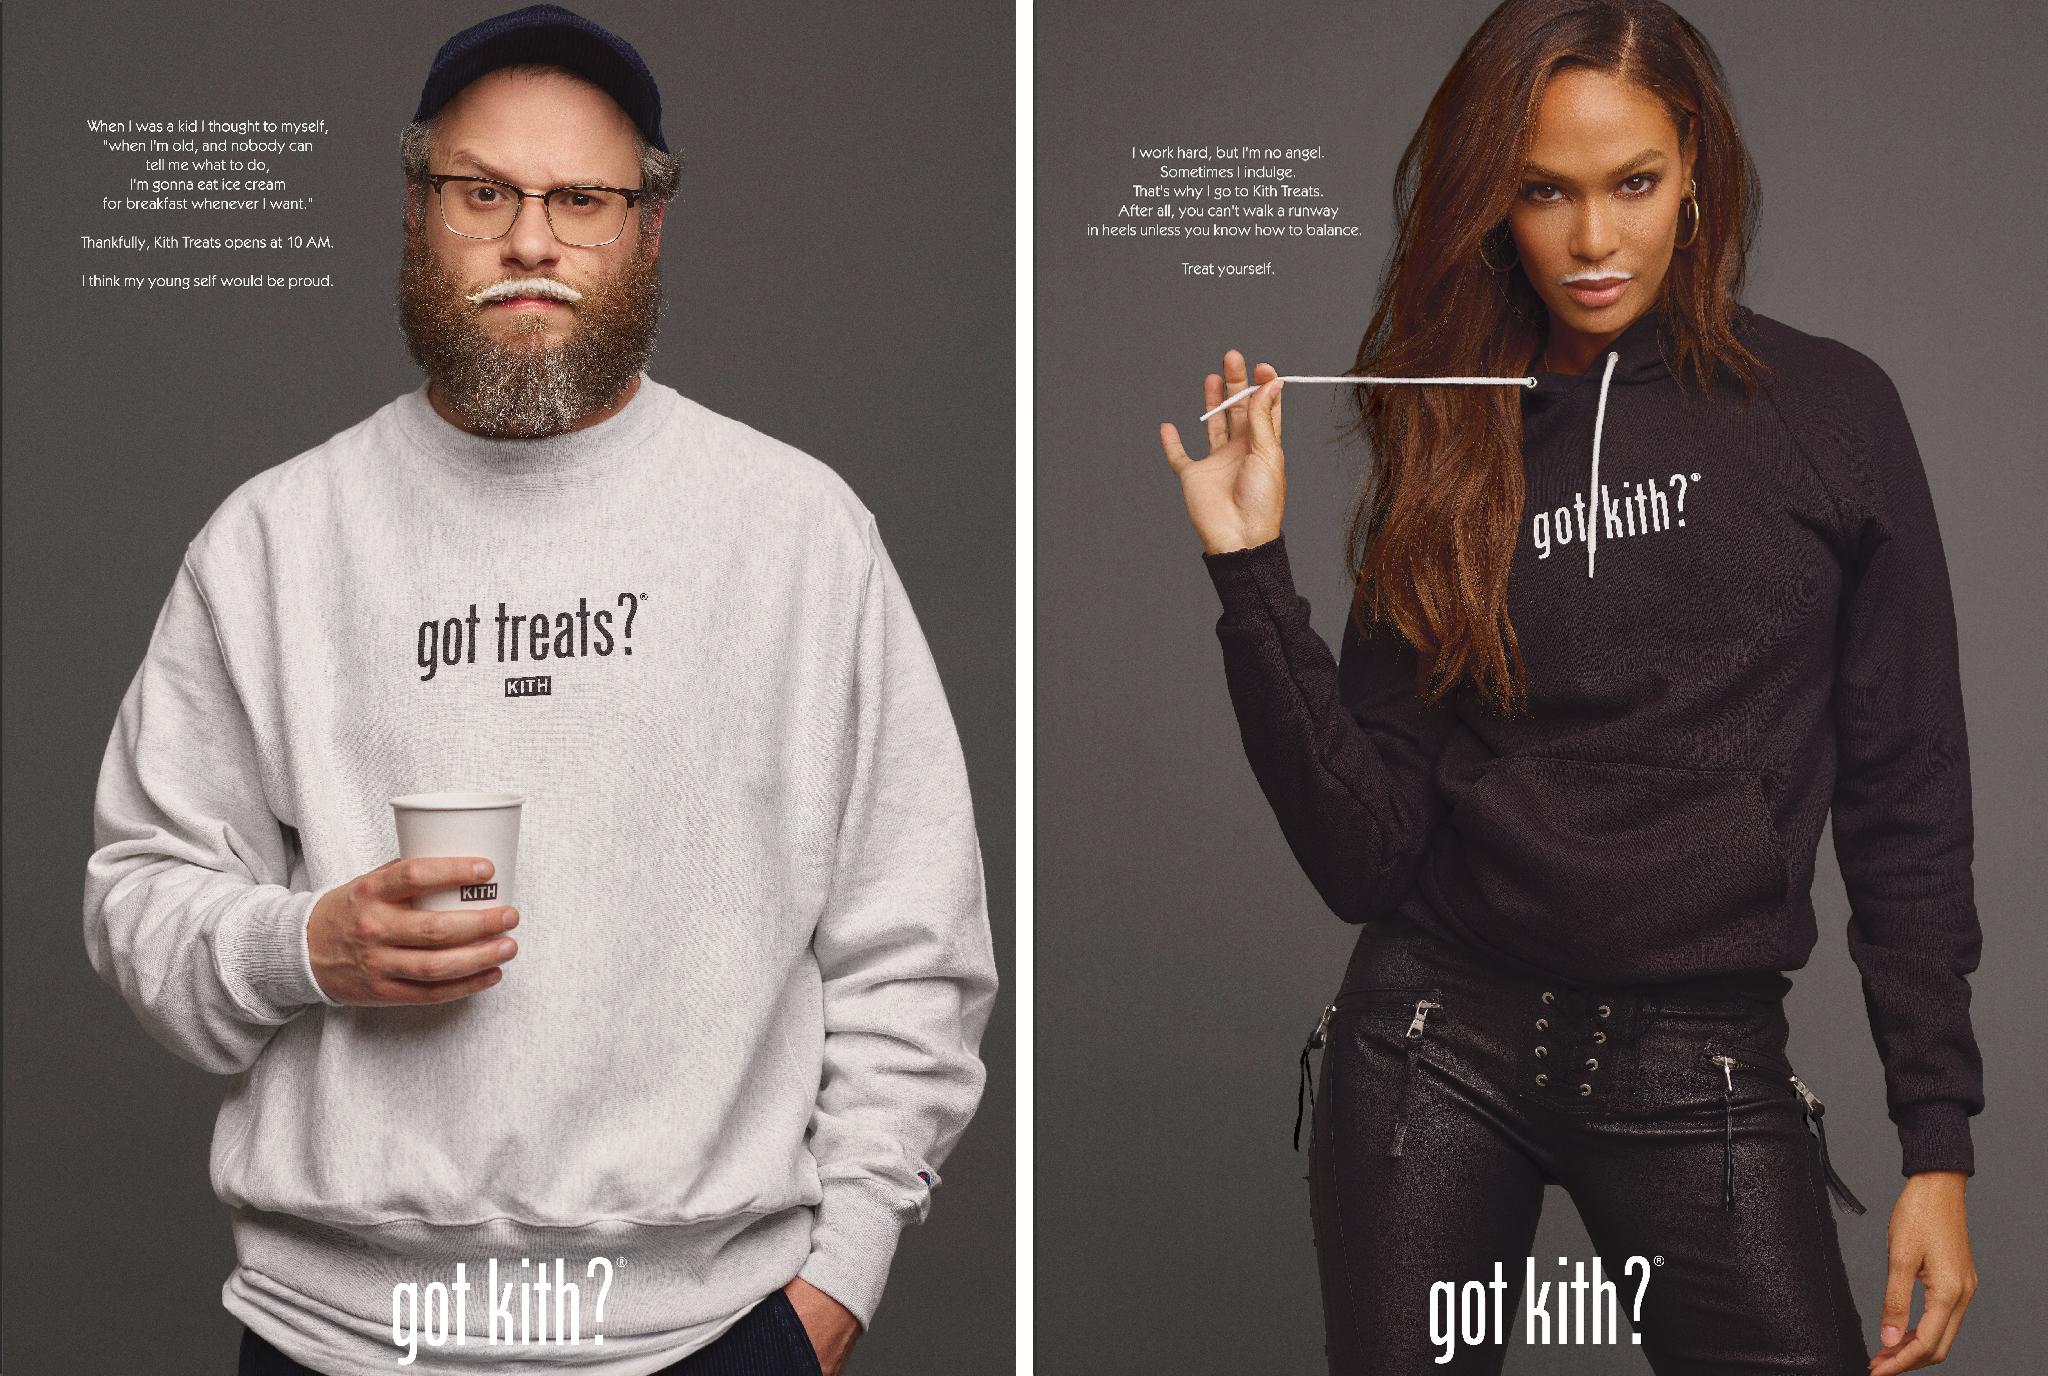 Kith Treats Got milk